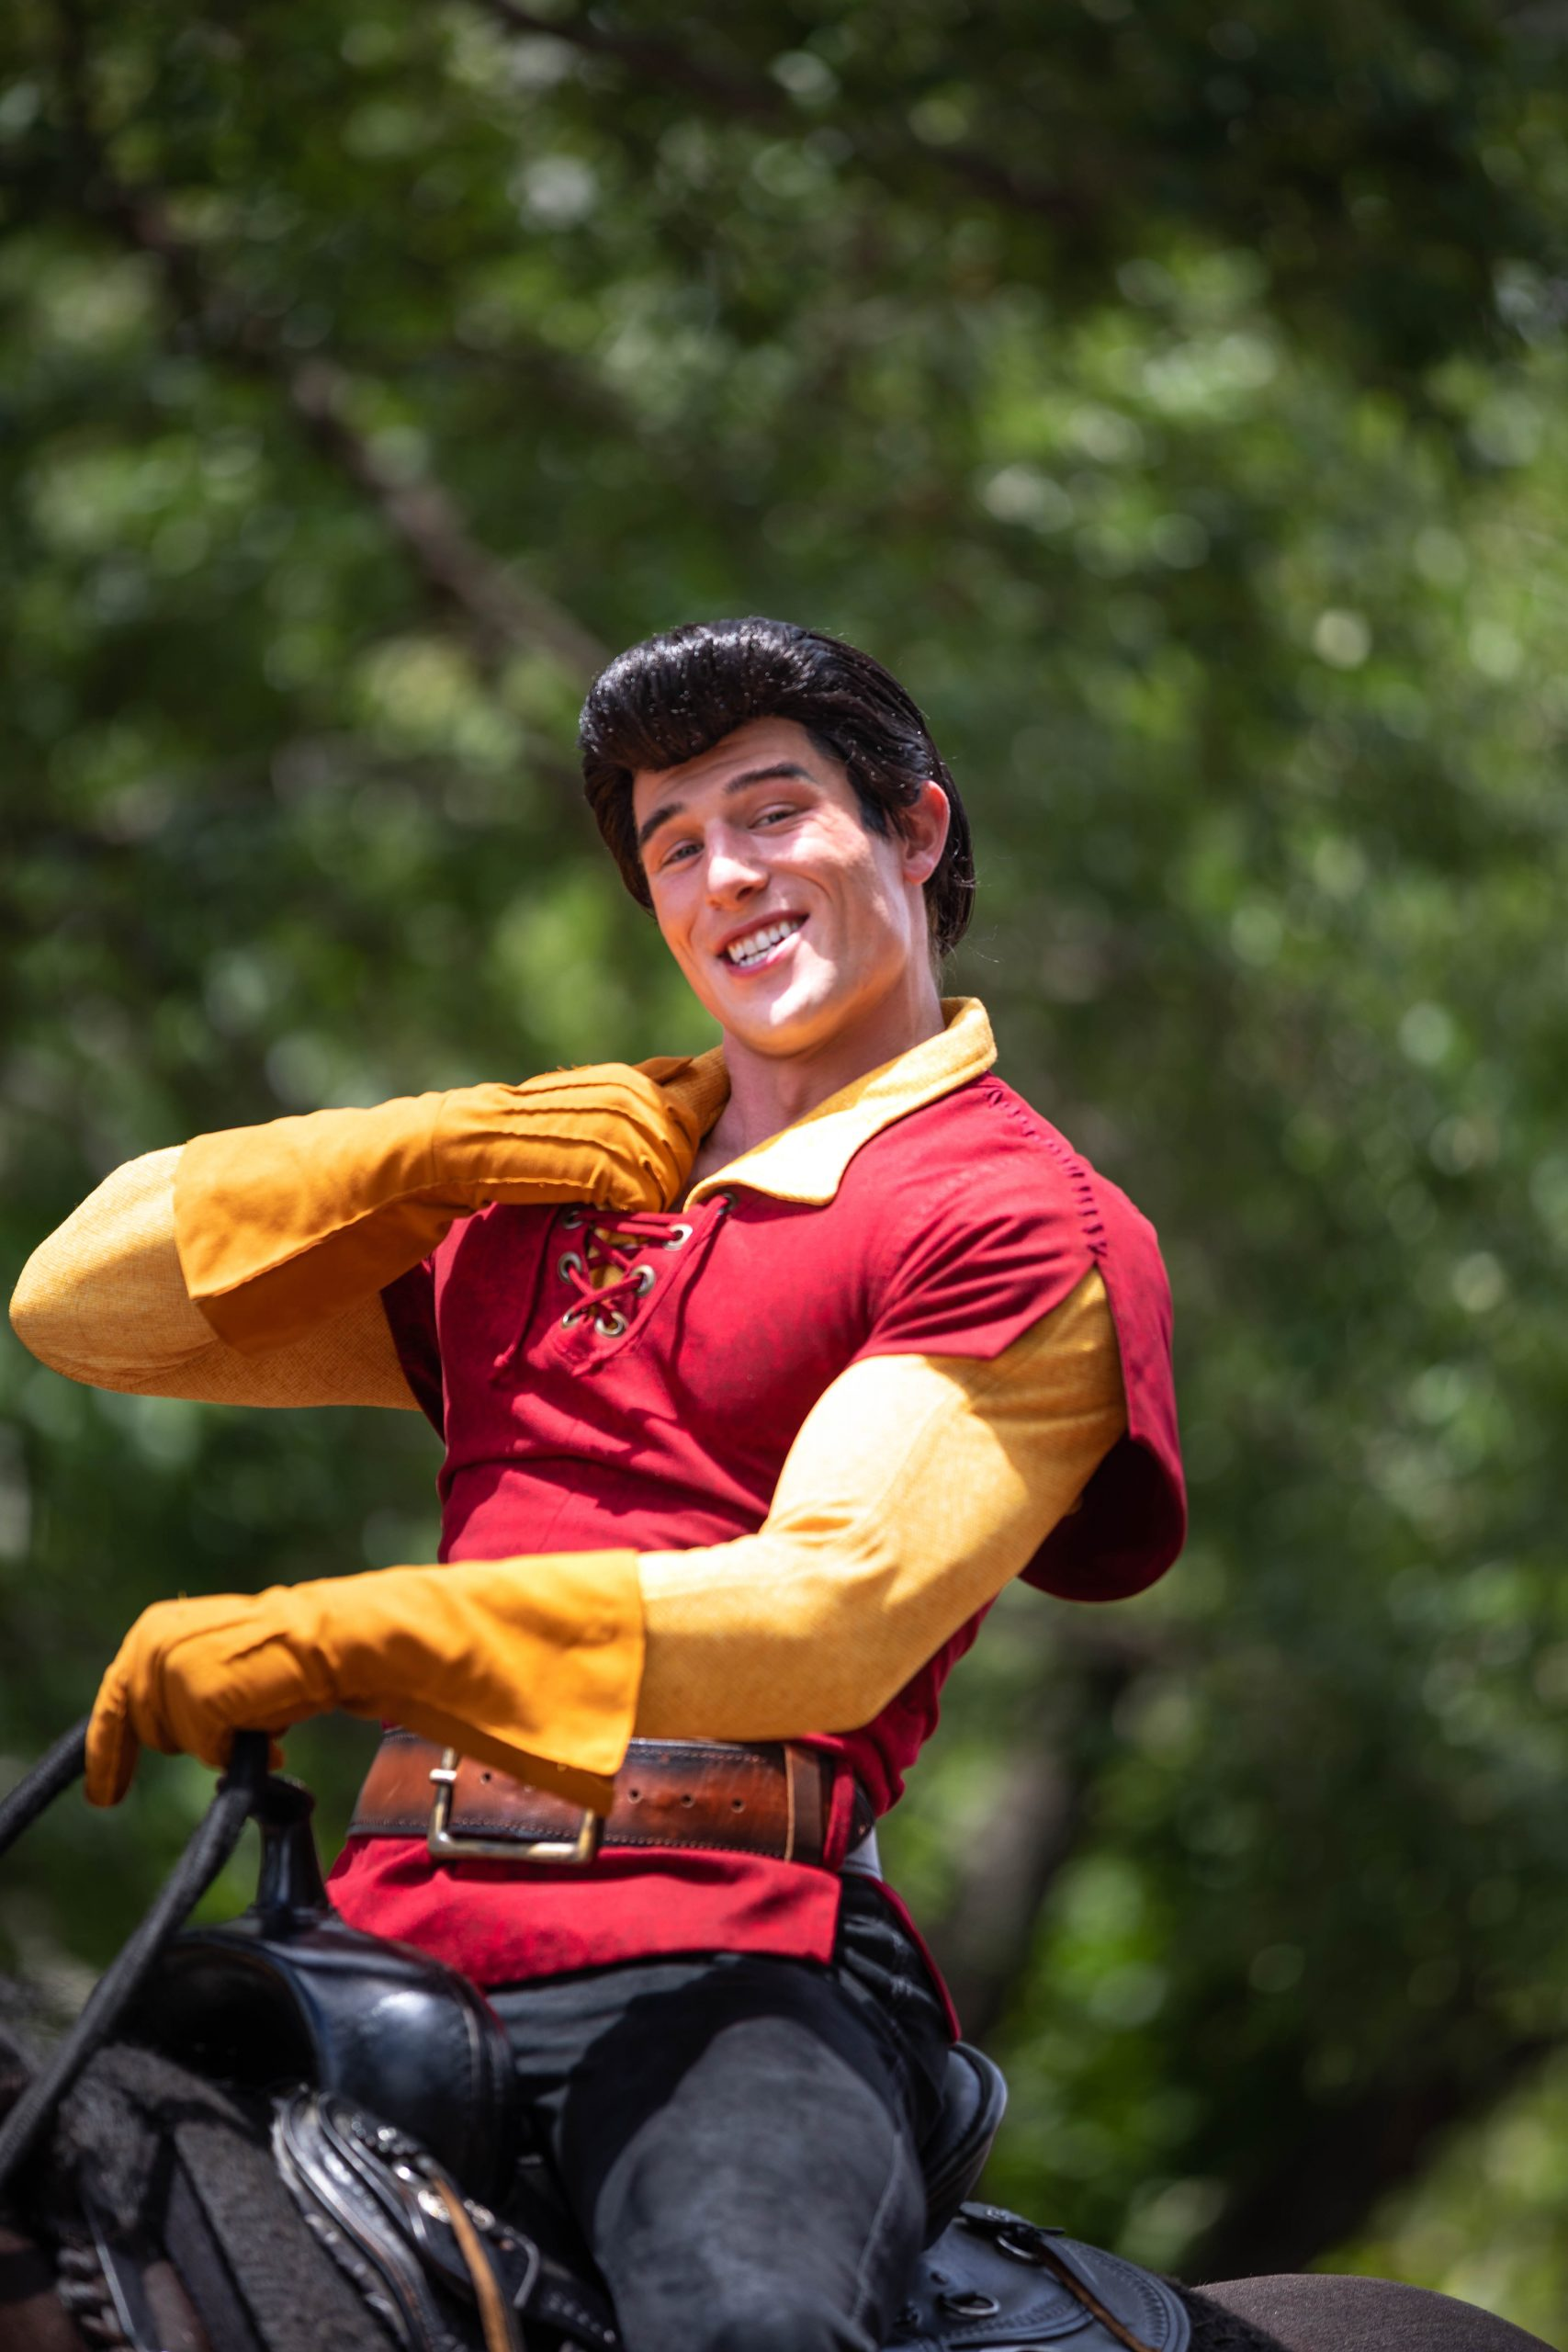 Photograph of Disney Villain Gaston at Walt Disney World Photographed by Luxury Travel Writer Annie Fairfax